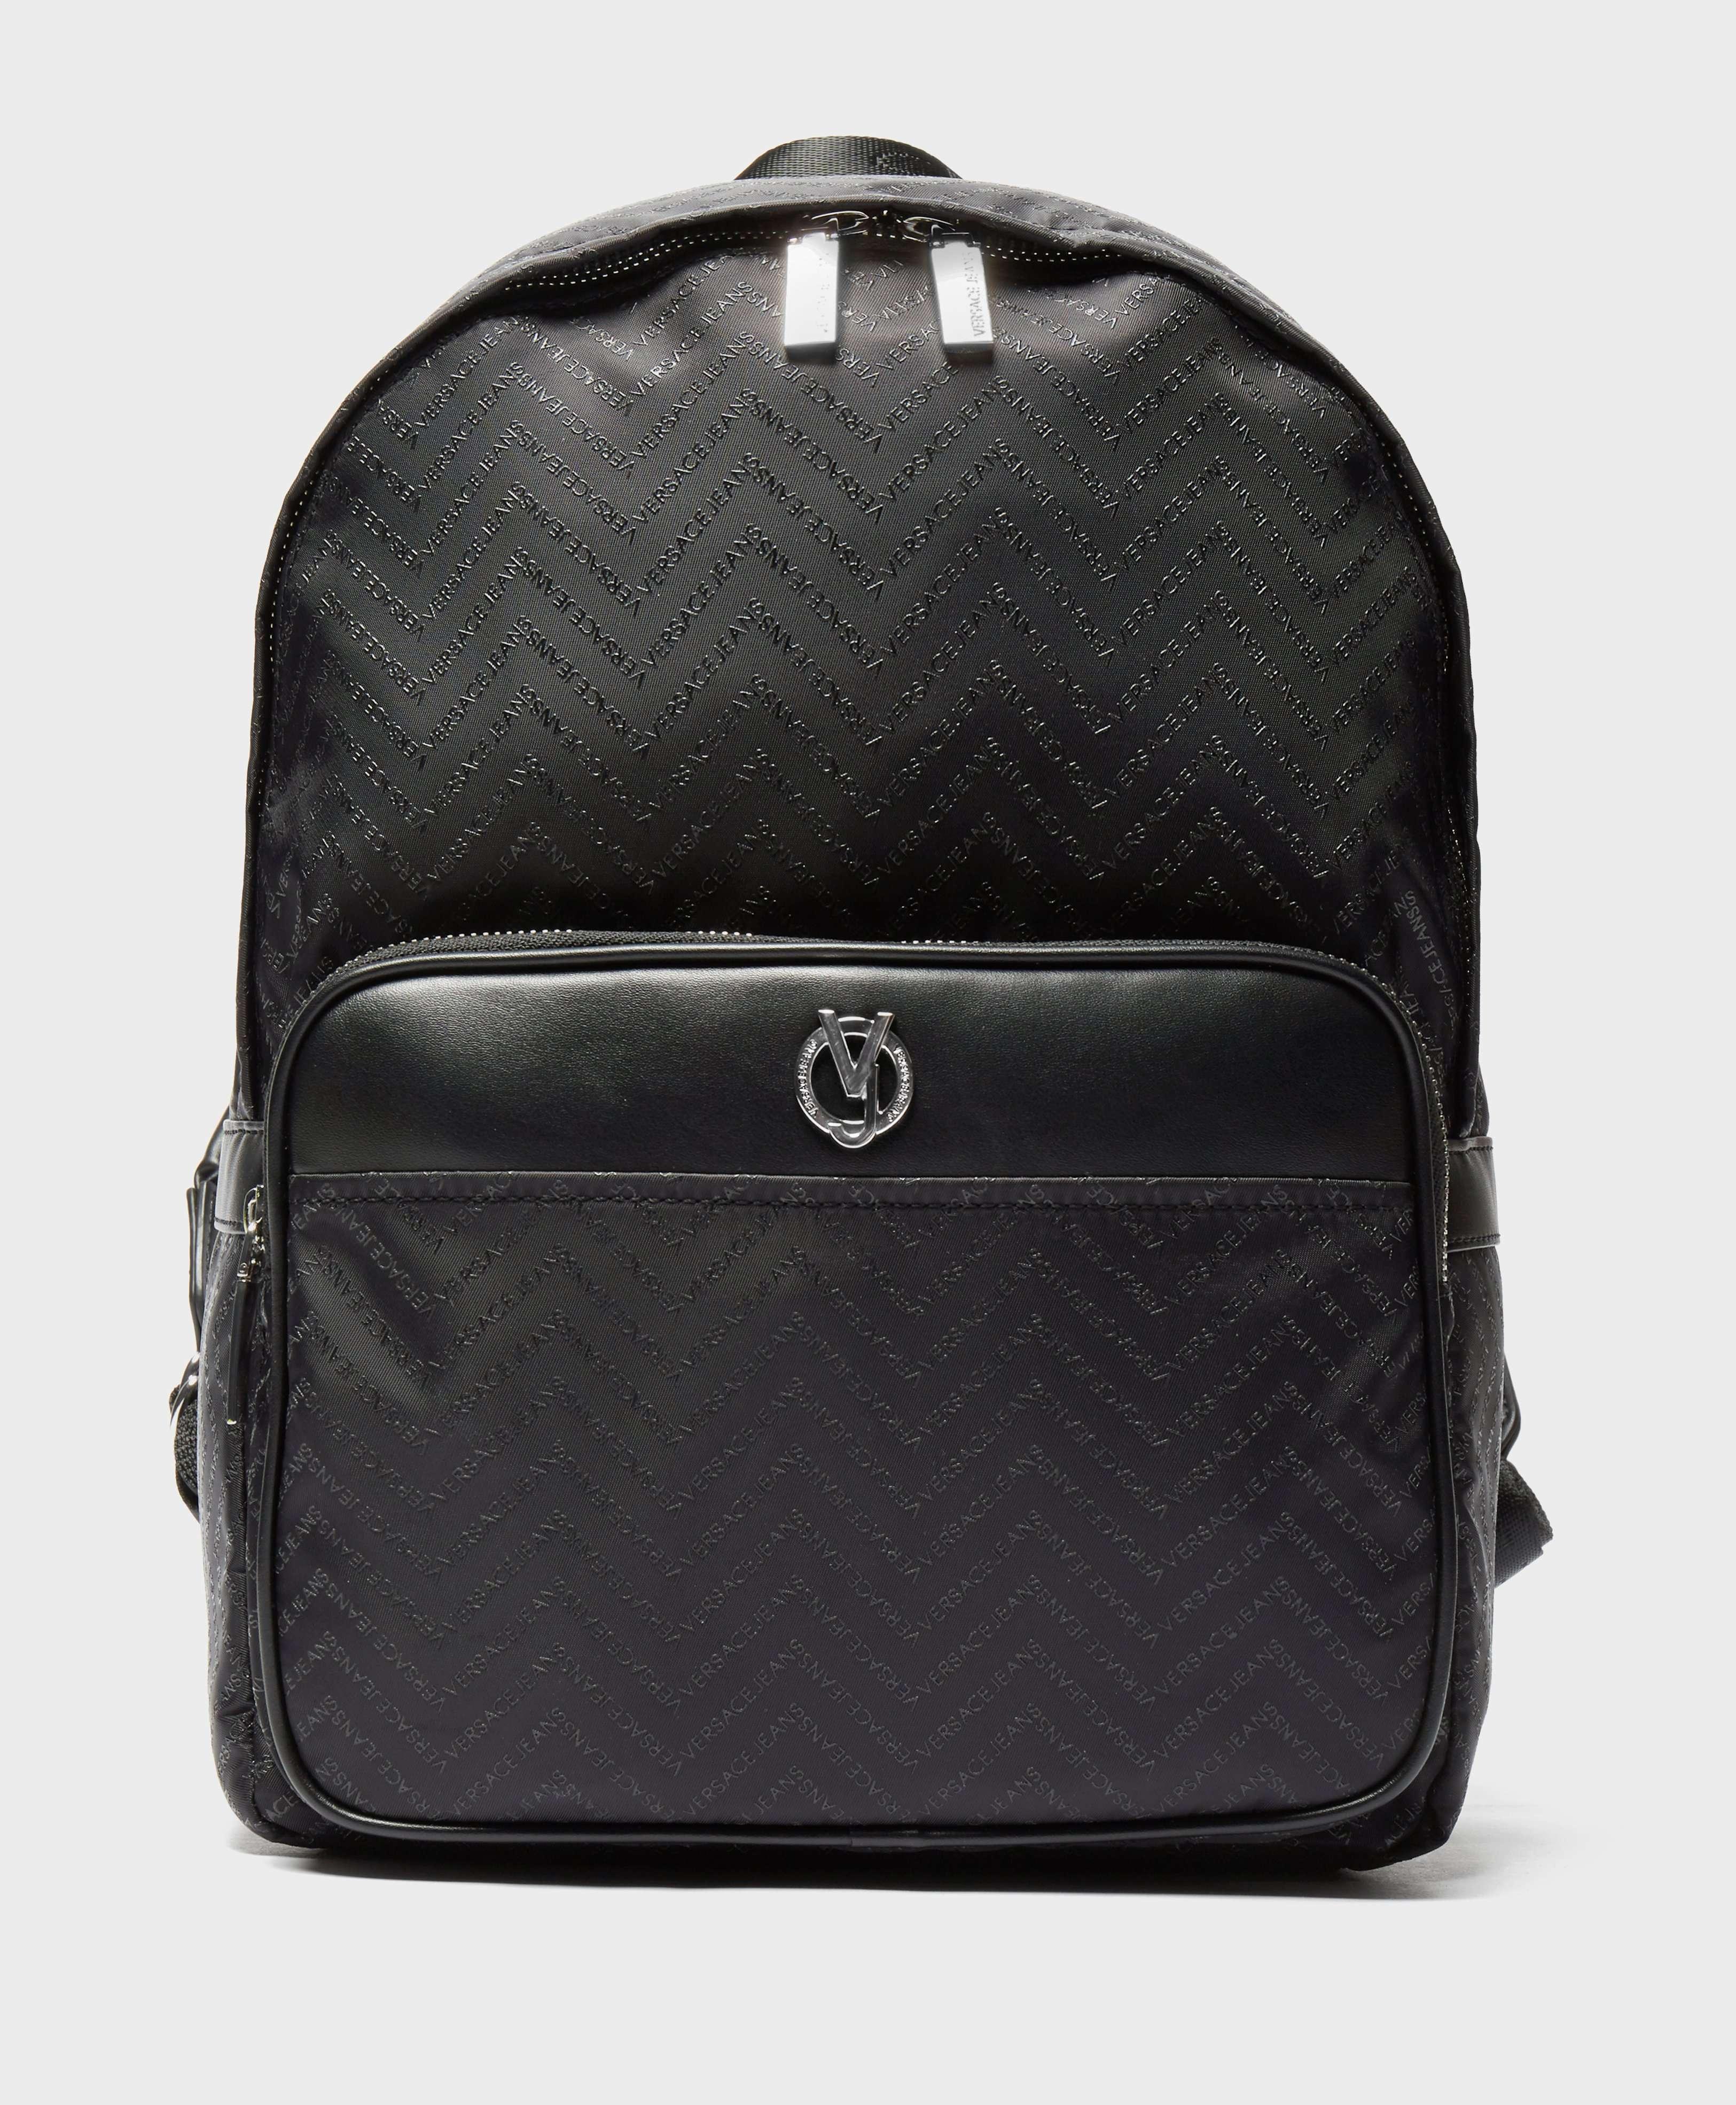 Versace Jeans Linea Chevron Backpack